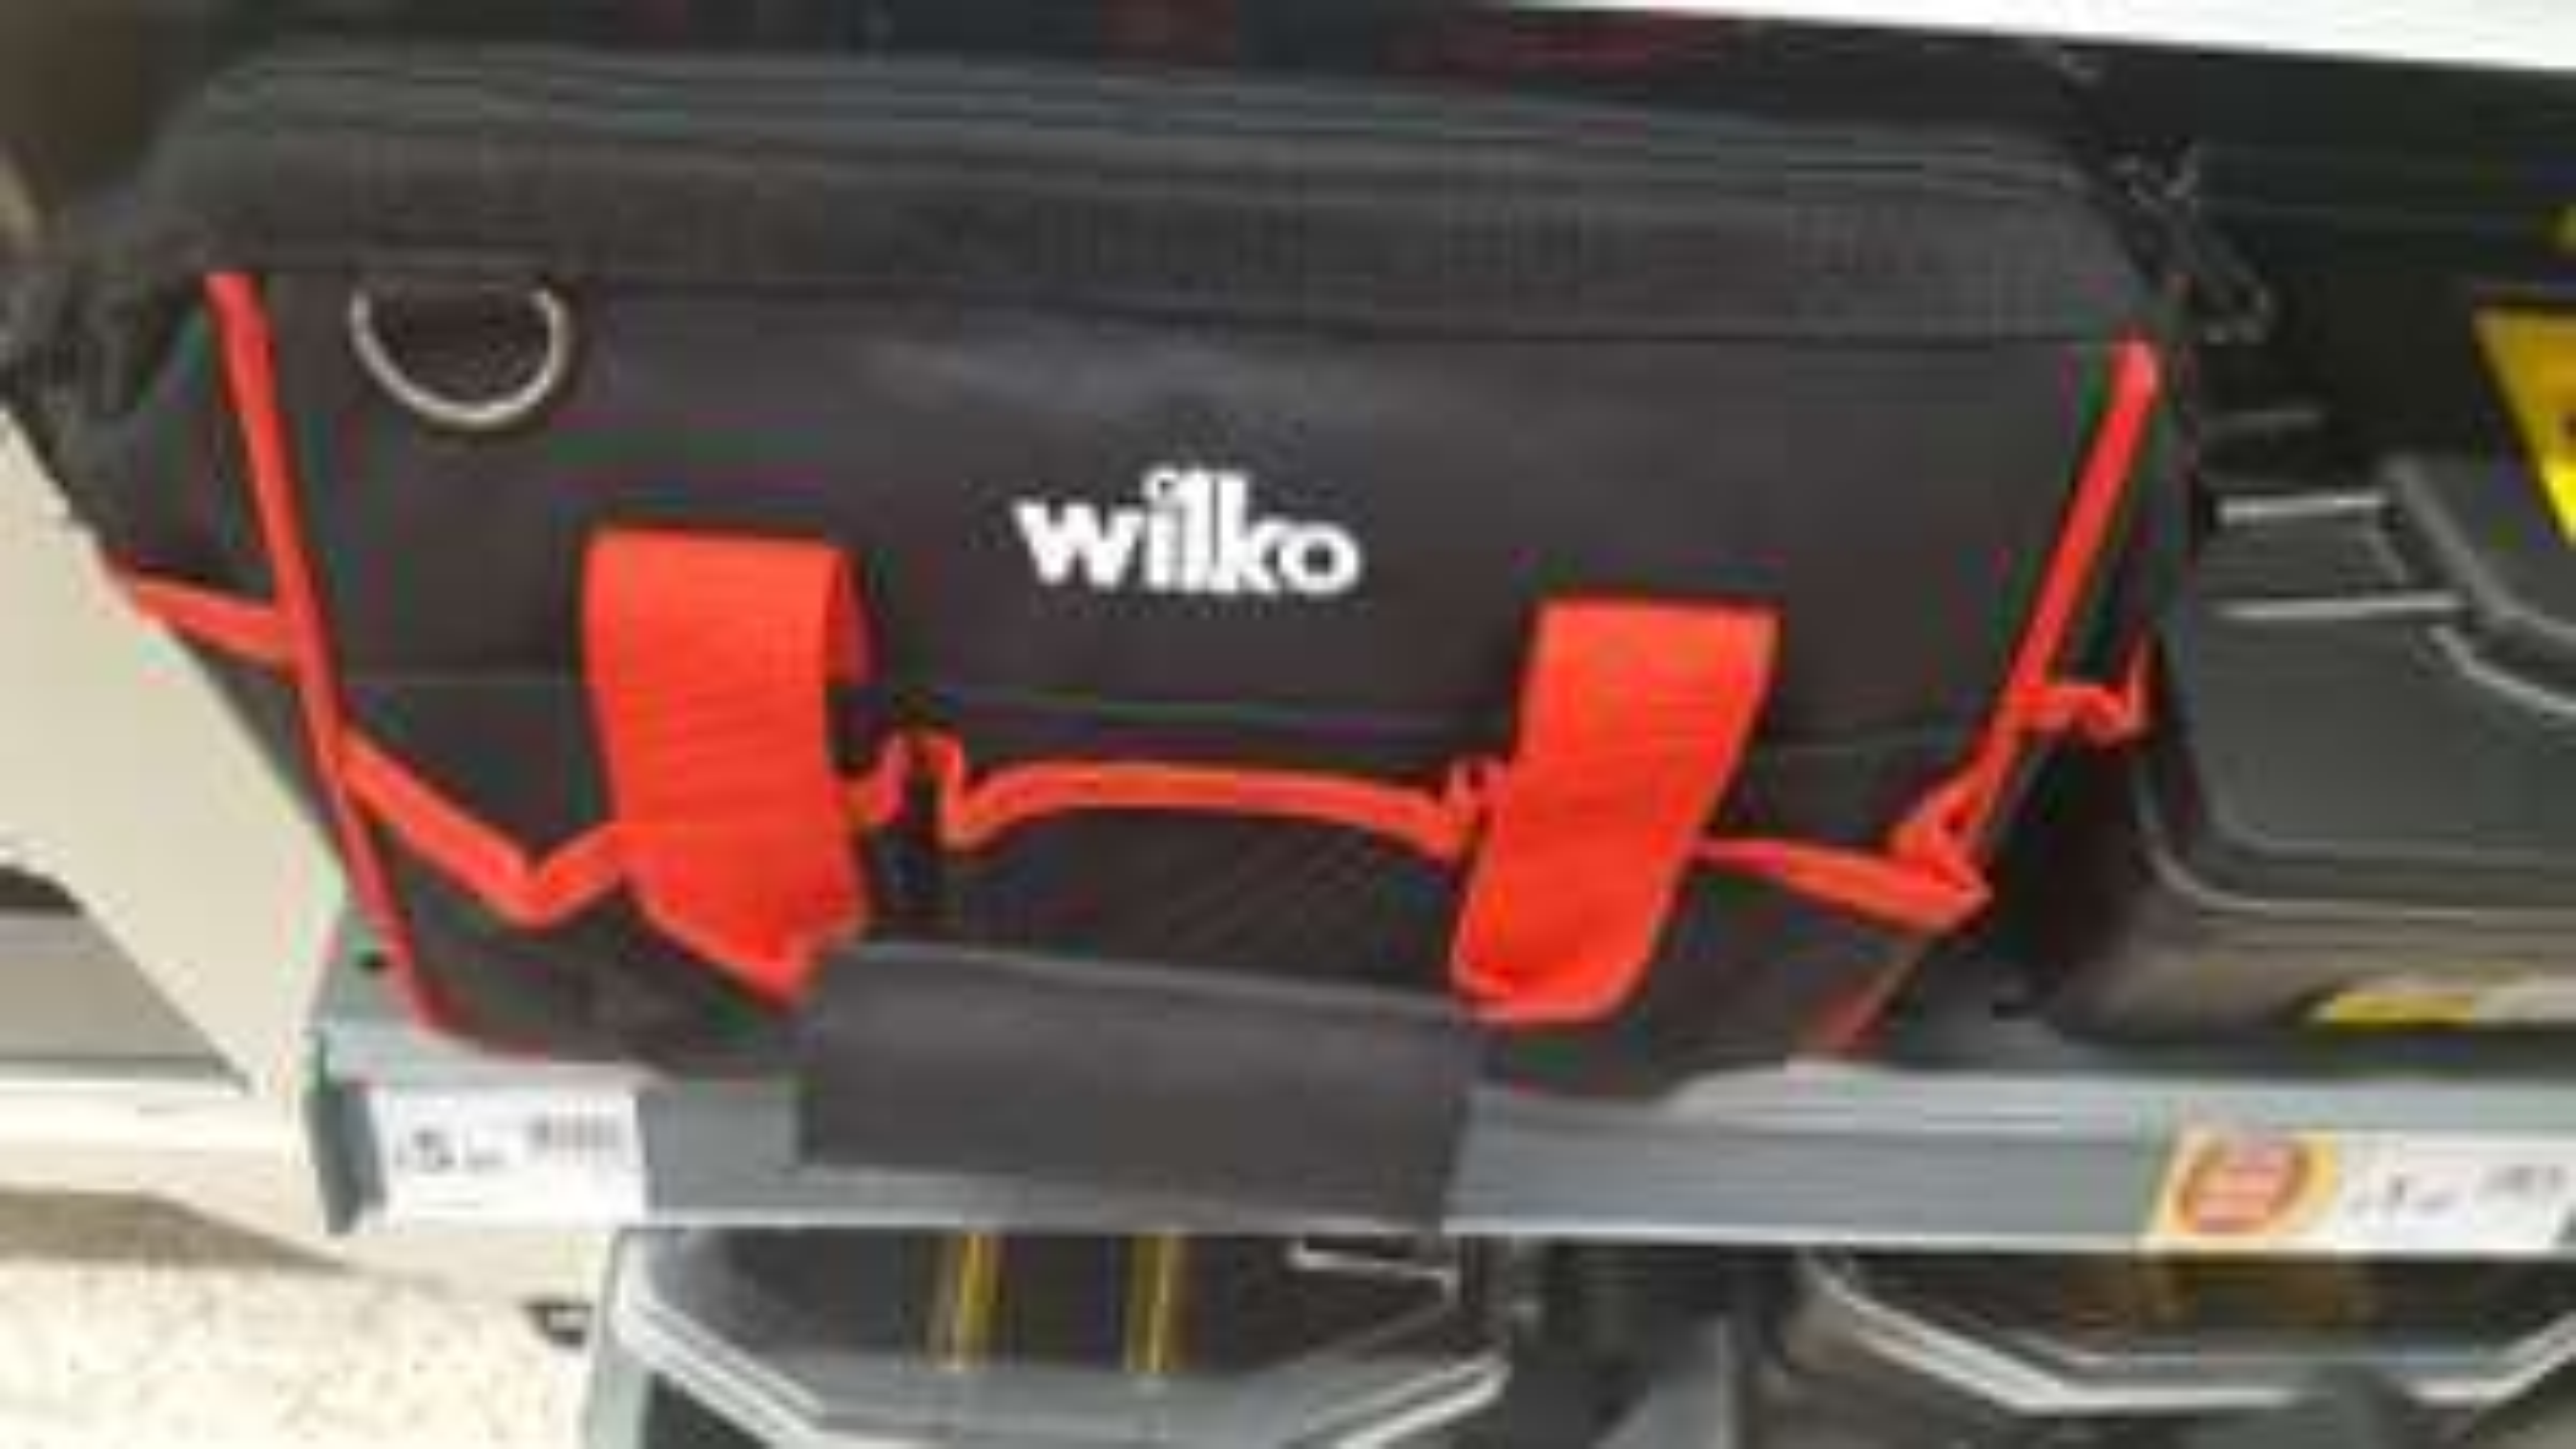 Wilko handy man tool kit bag £5